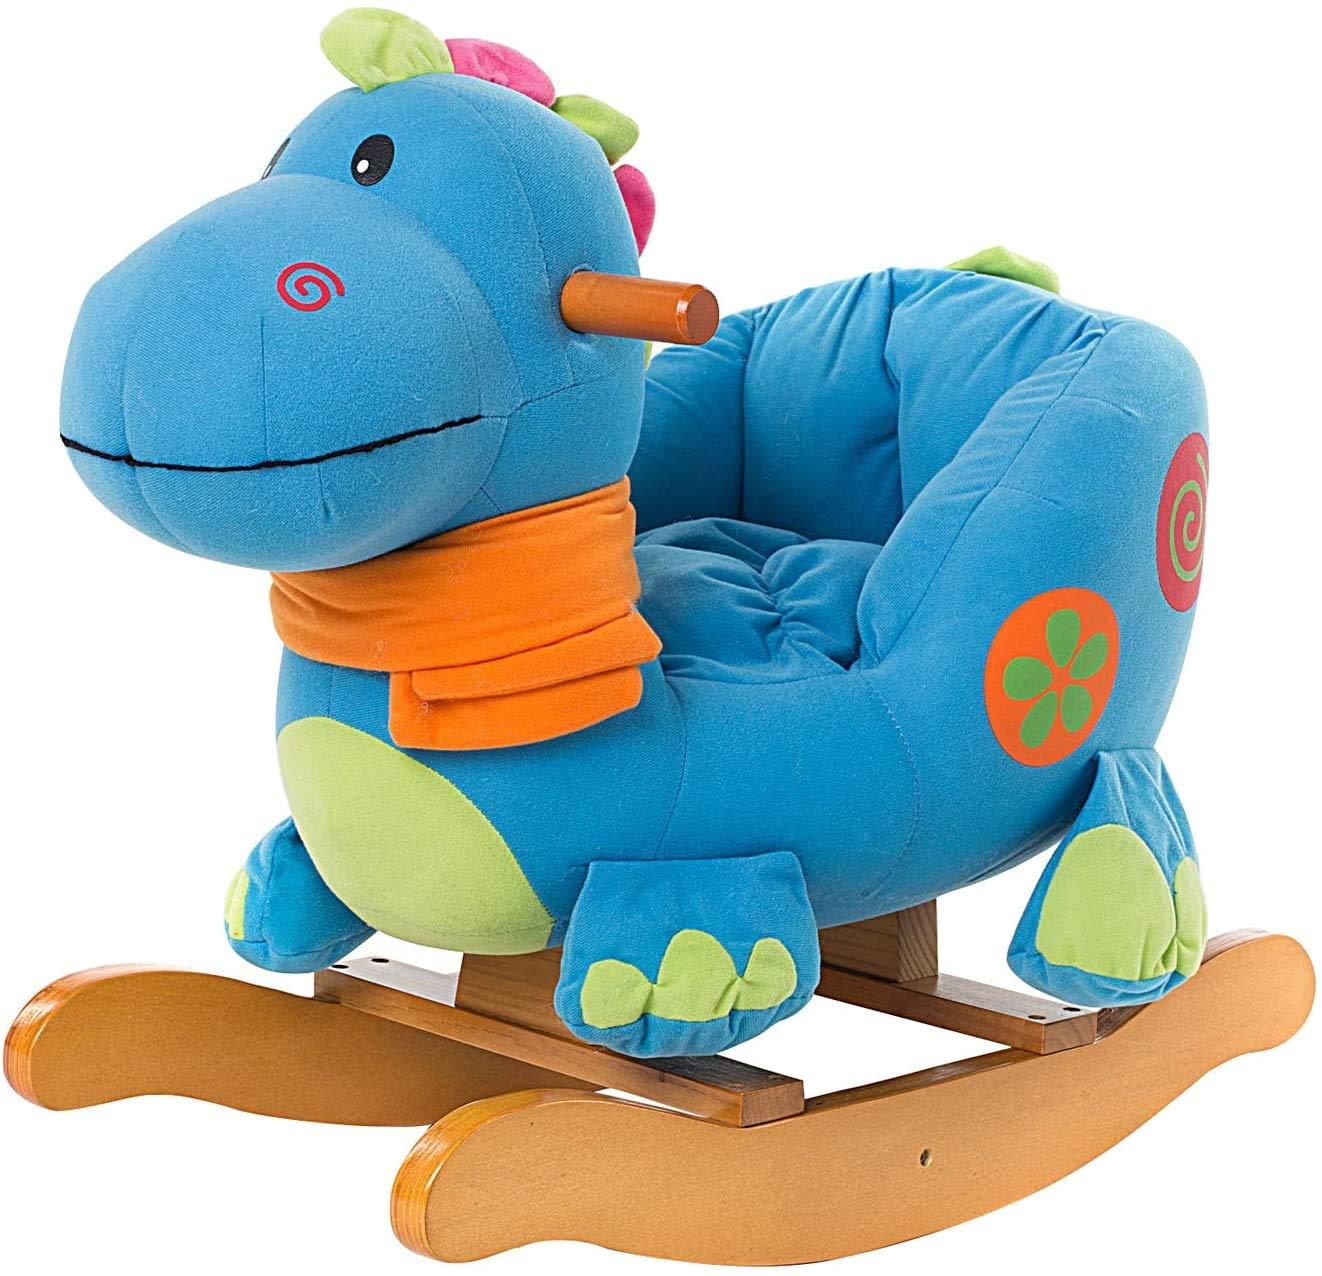 Labebe Caballito Balancin Bebé, Caballito Madera De Dinosaurio Azul para Niño De 1-3 Años, Turnraise Balancin/Caballo Balancin Bebé/Caballito Balancin Madera/Columpio Balancin Bebé…: Amazon.es: Juguetes y juegos